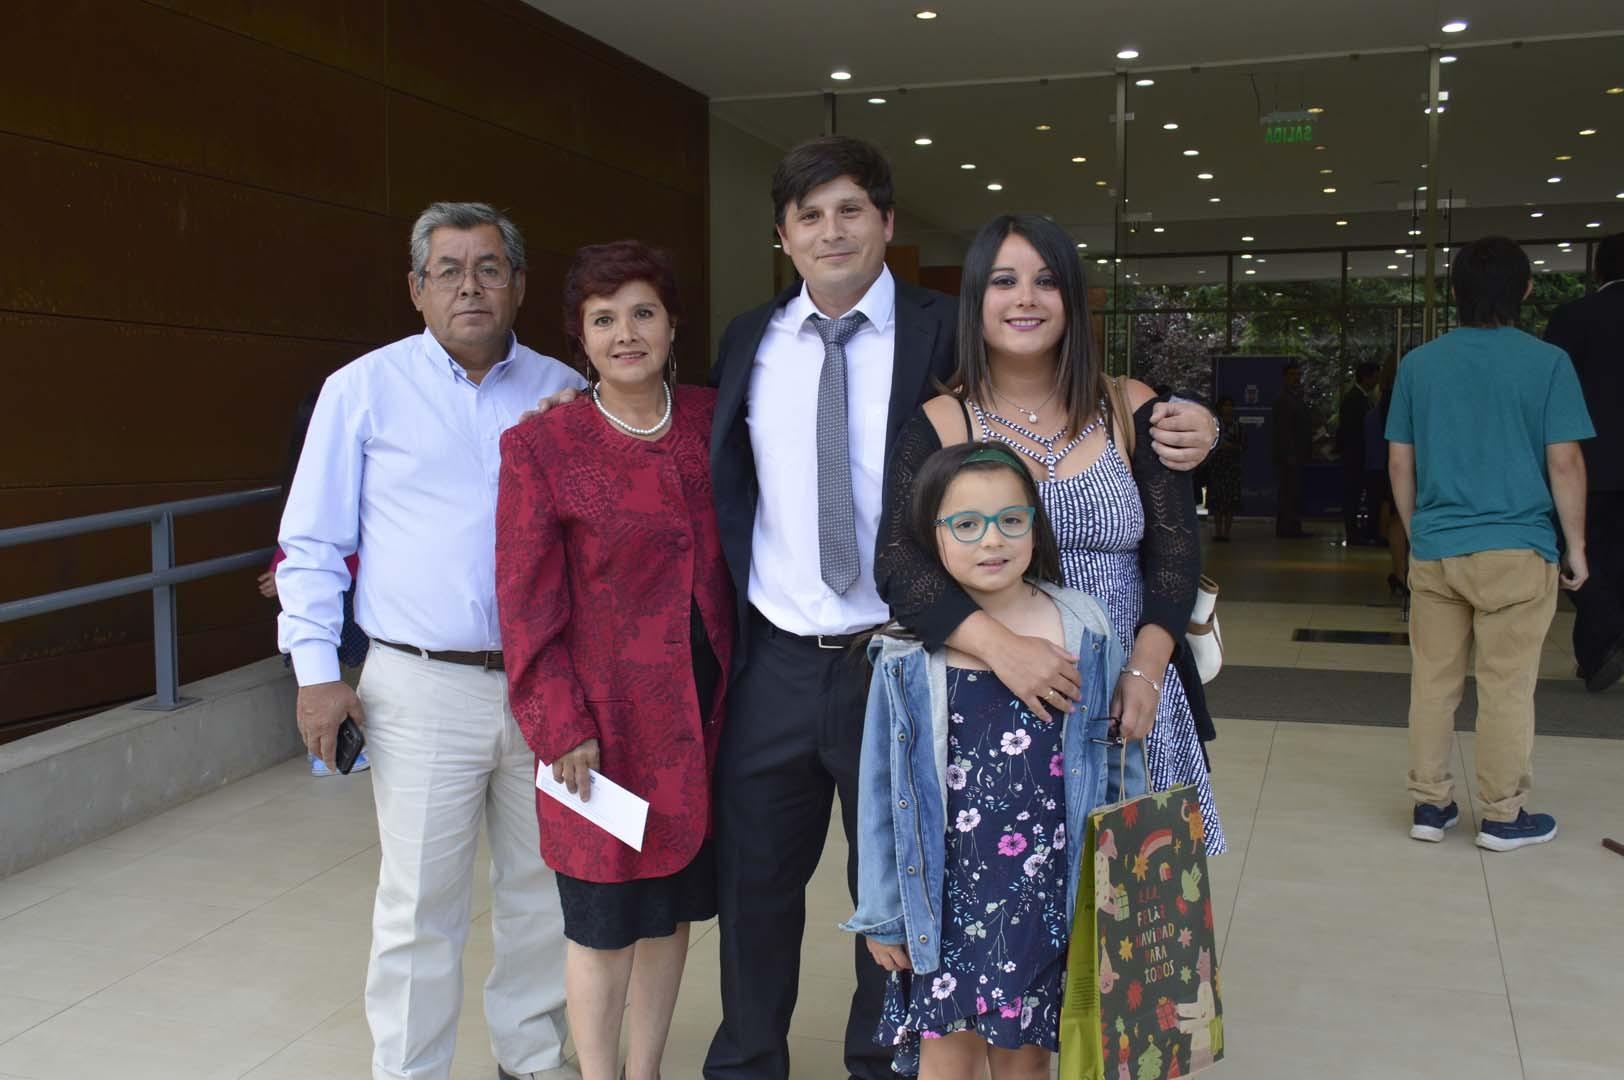 Adrián Campos, Nadia Riquelme, Josué Nabrat, Madelyn Mella y Magdalena Nabrat